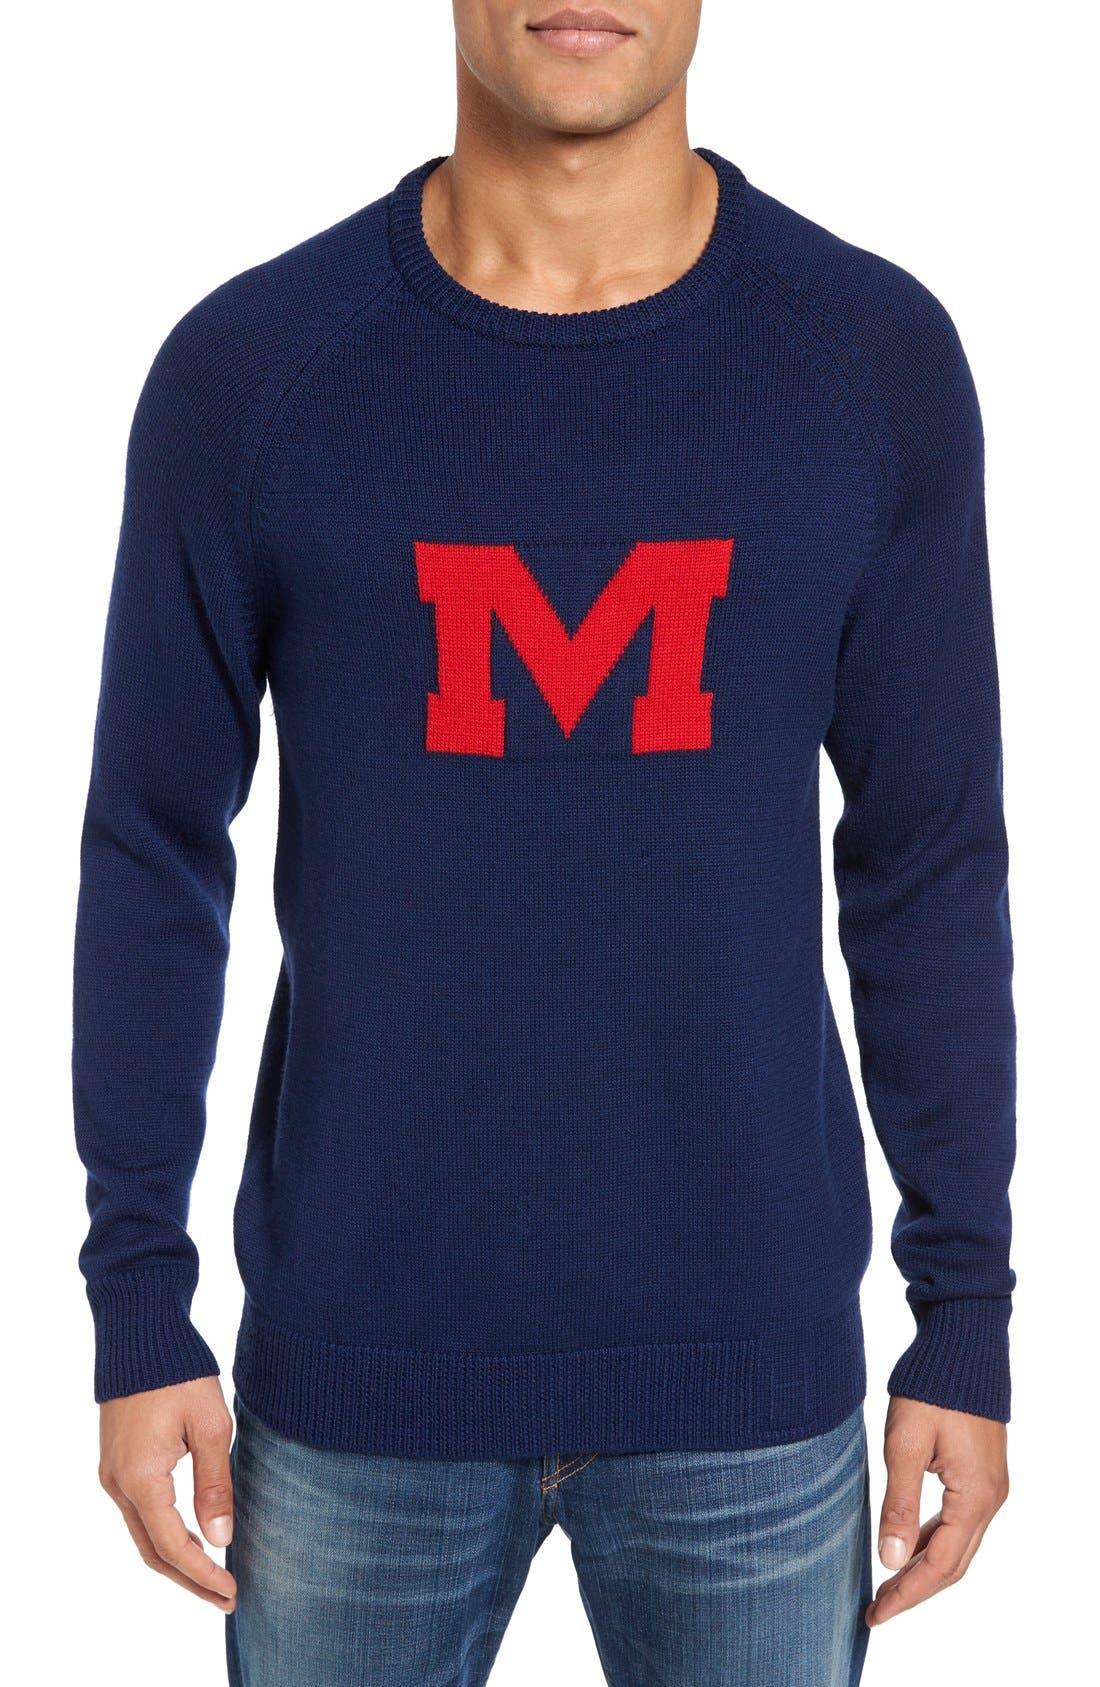 Alternate Image 1 Selected - Hillflint Ole Miss Heritage Sweater